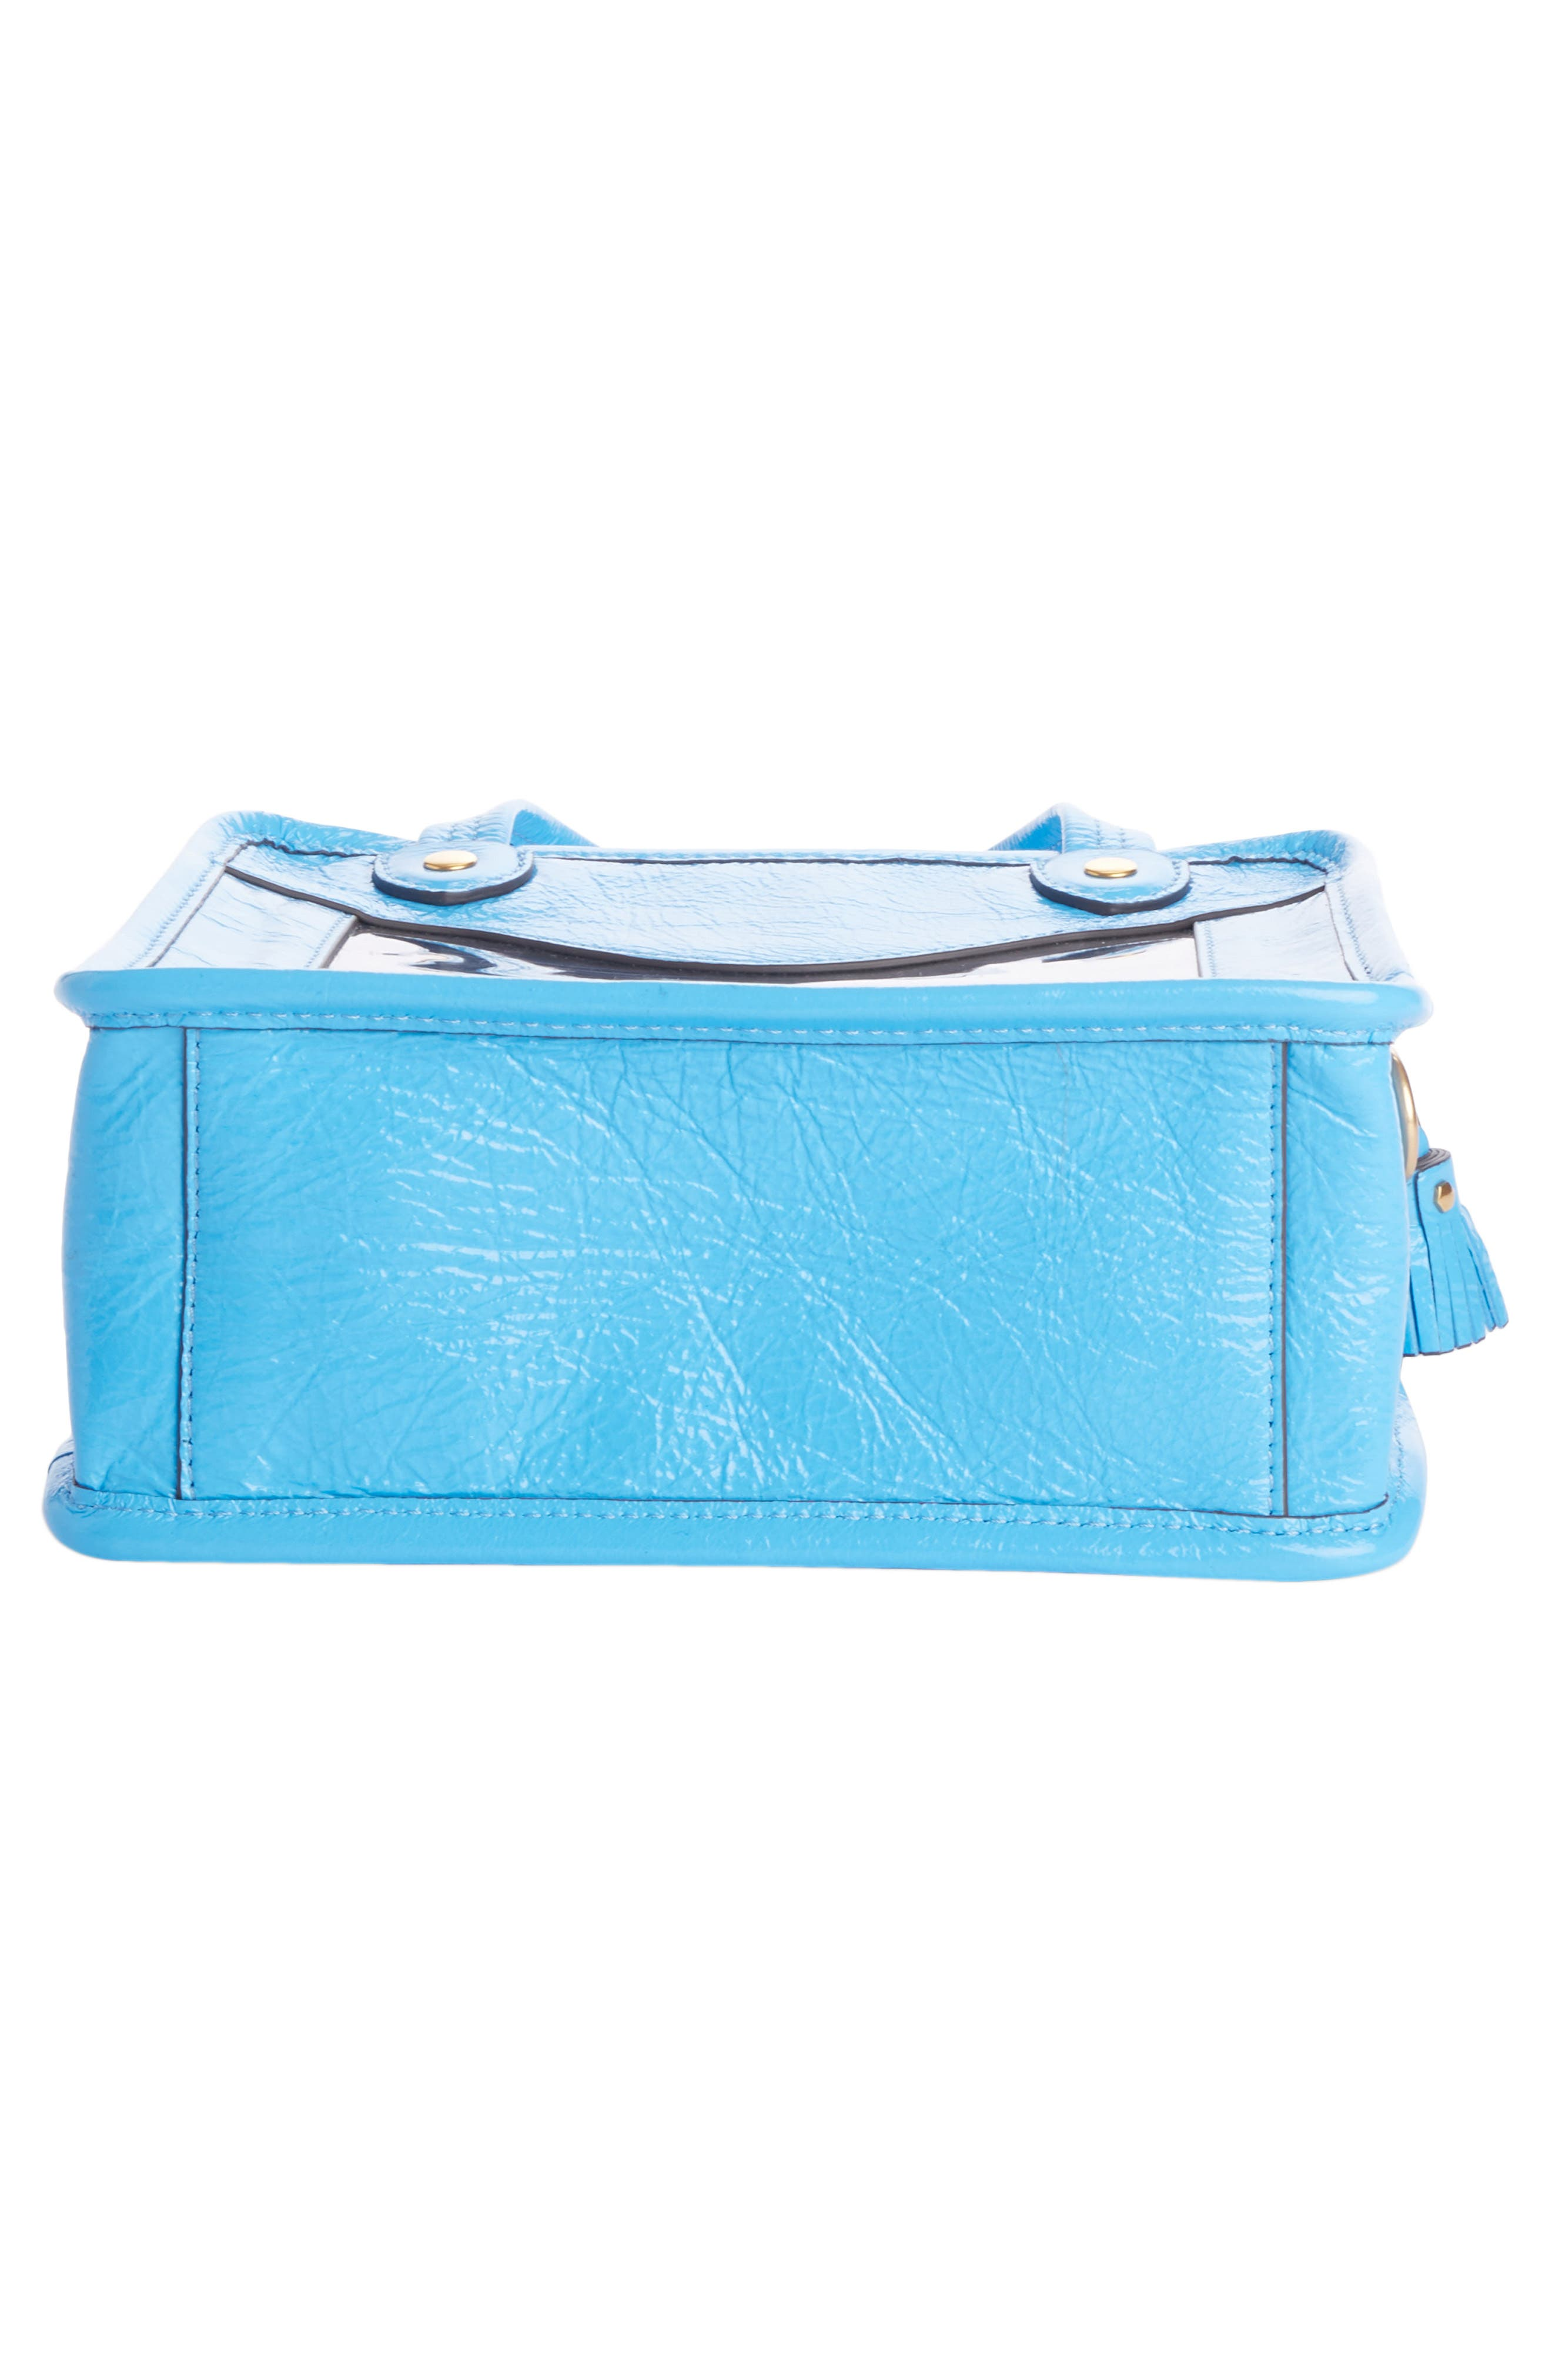 Rainy Day Crossbody Bag,                             Alternate thumbnail 4, color,                             Blue Quilt